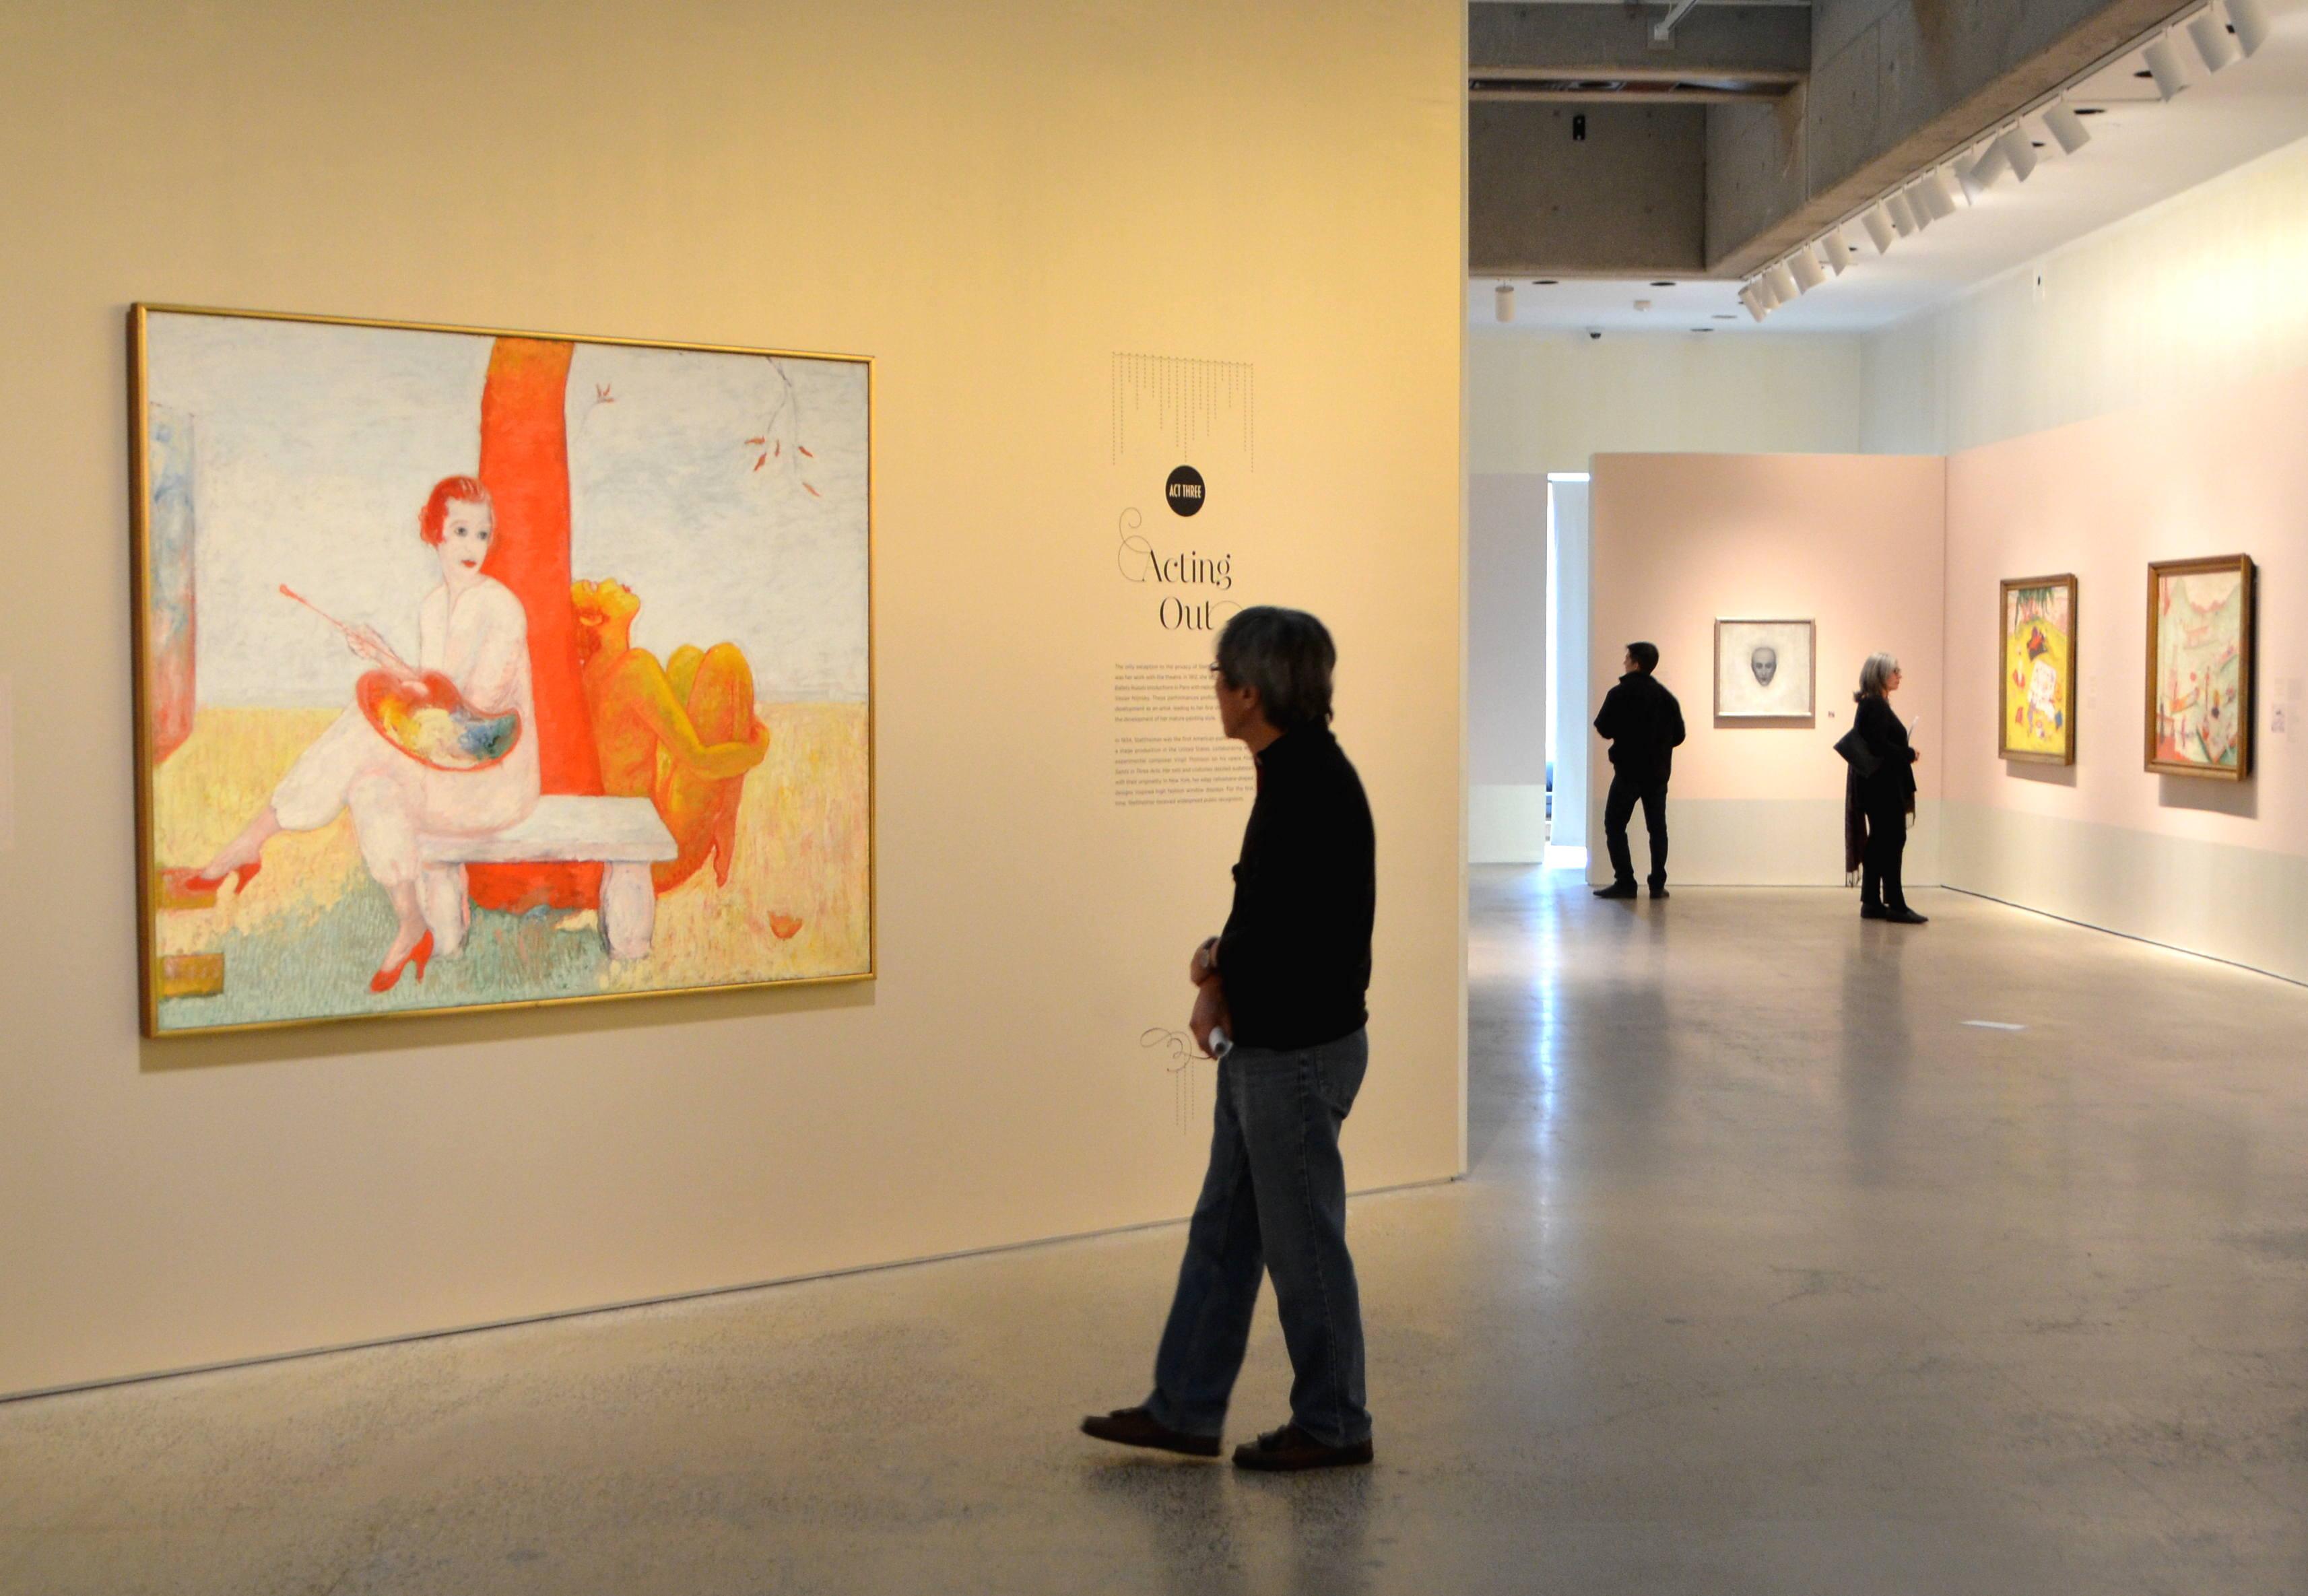 Art Gallery of Ontario | as I walk Toronto